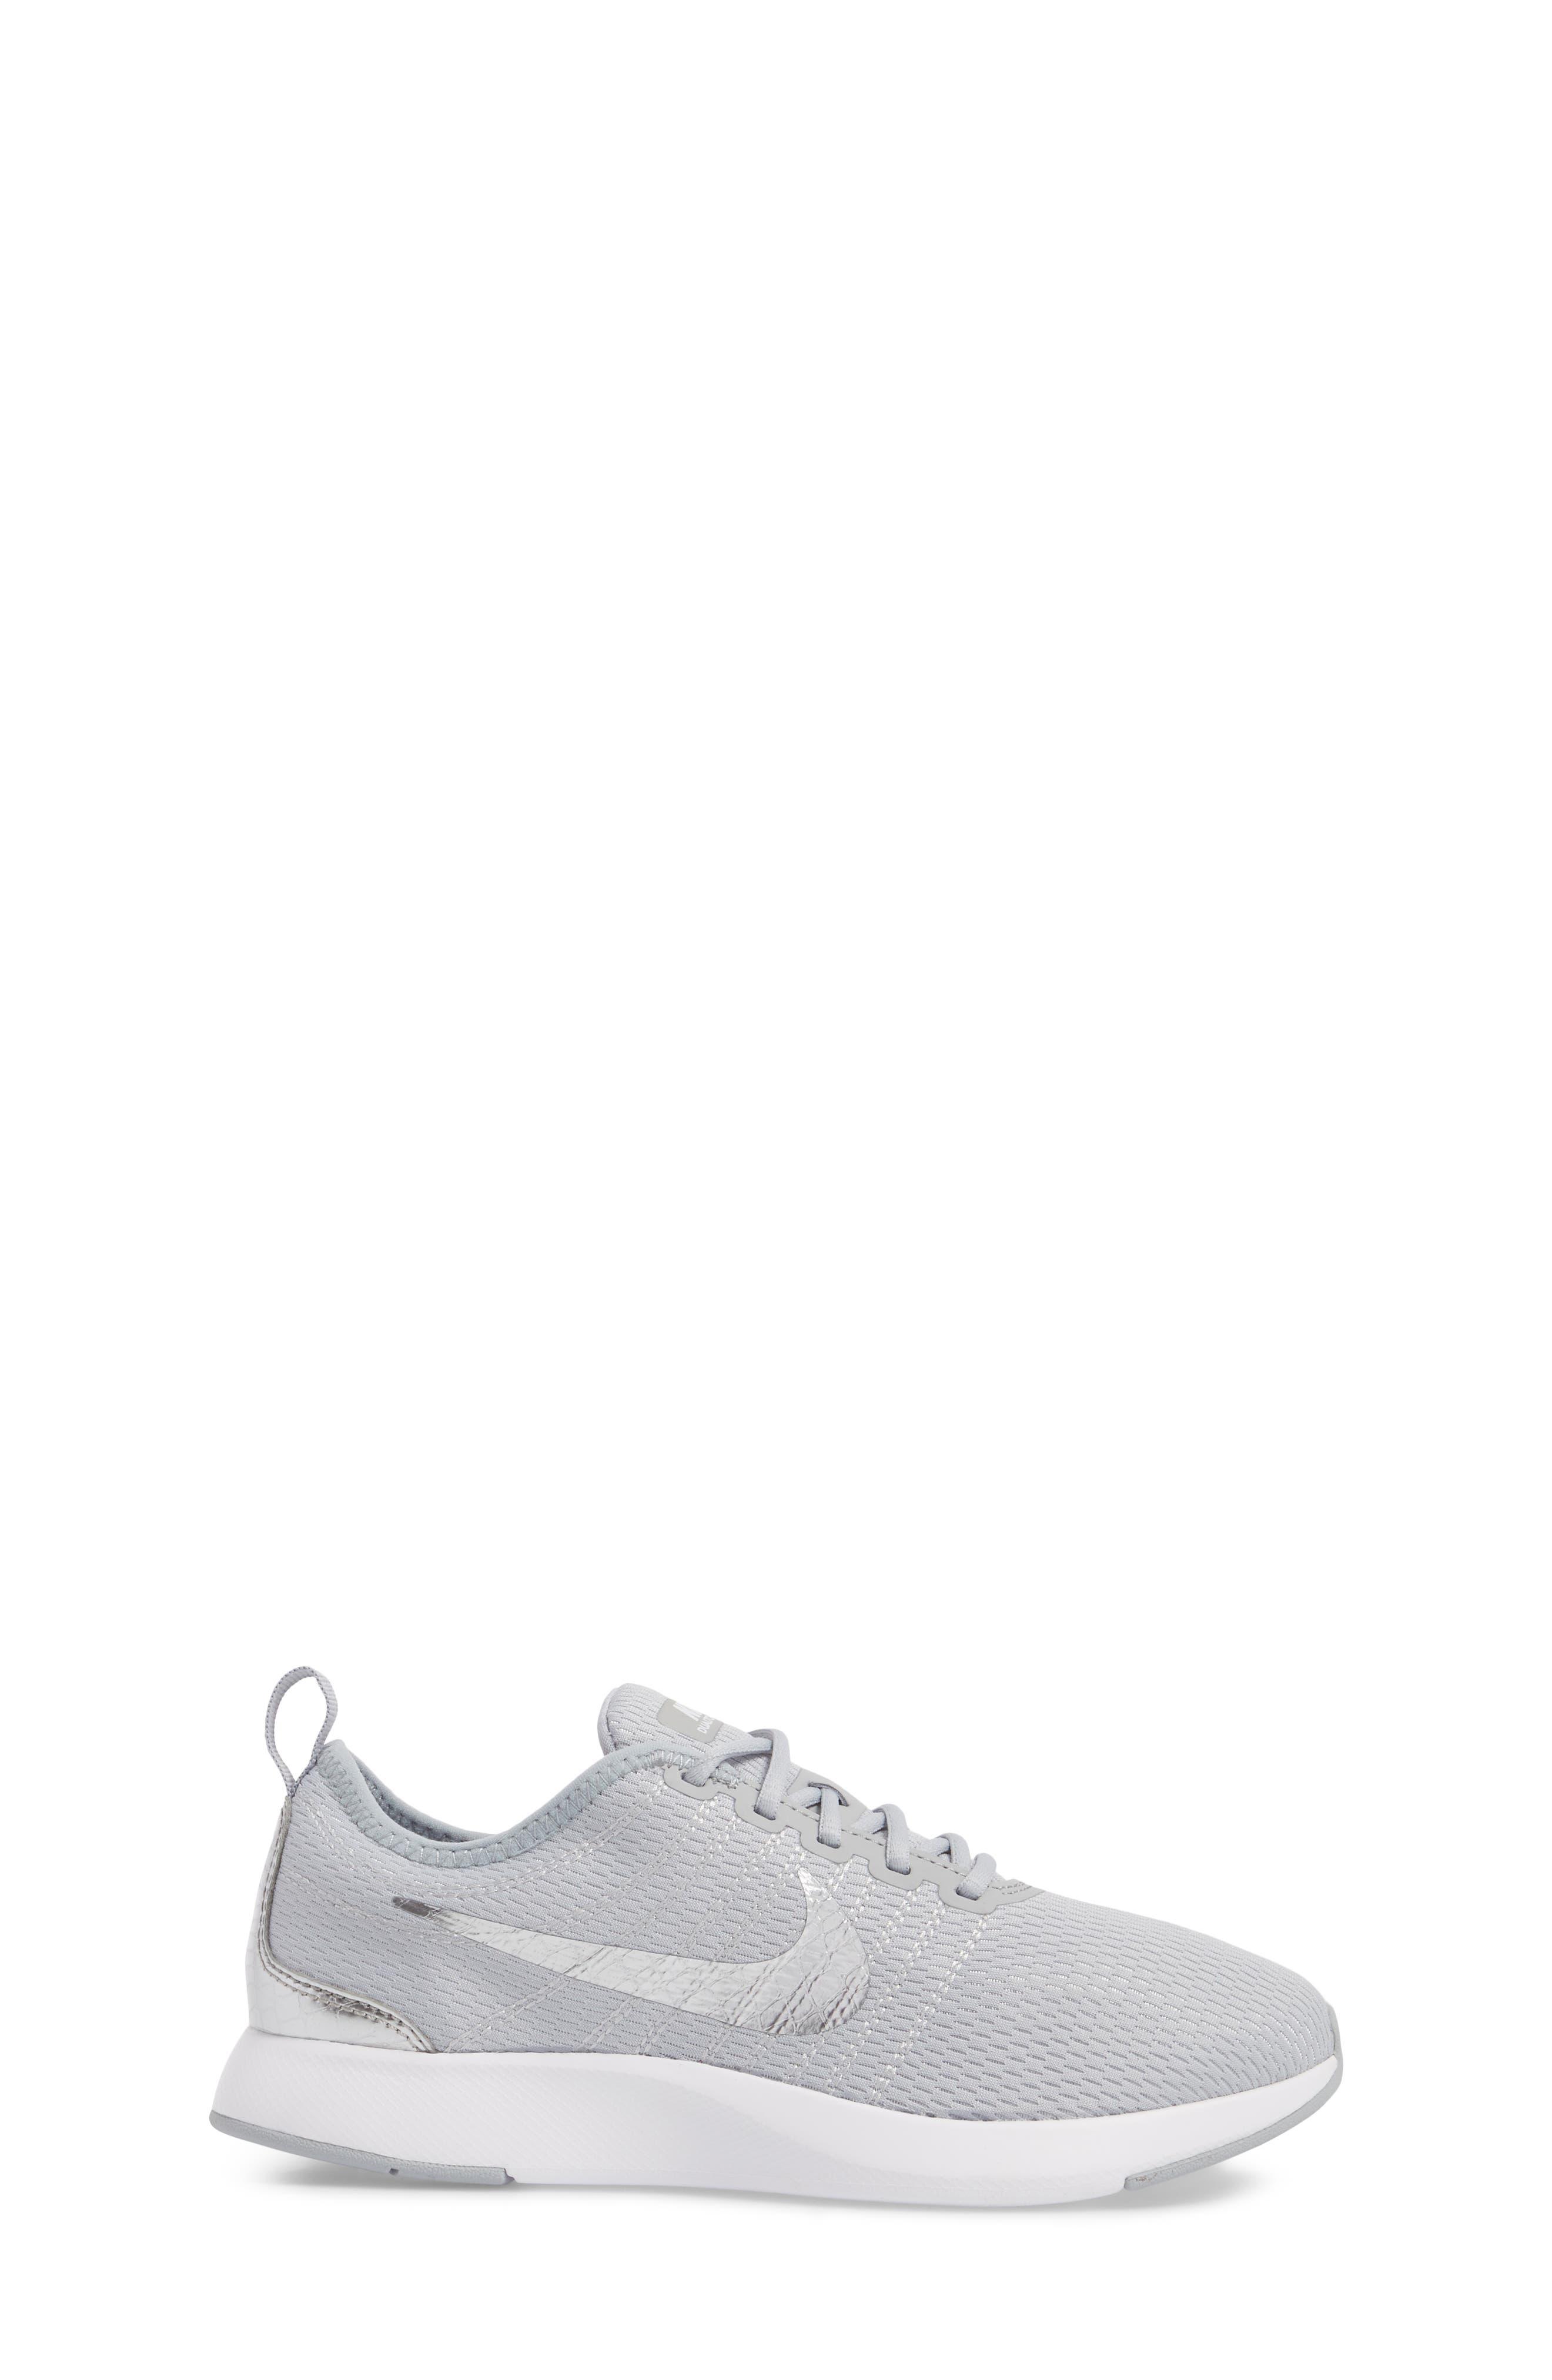 Dualtone Racer GS Sneaker,                             Alternate thumbnail 10, color,